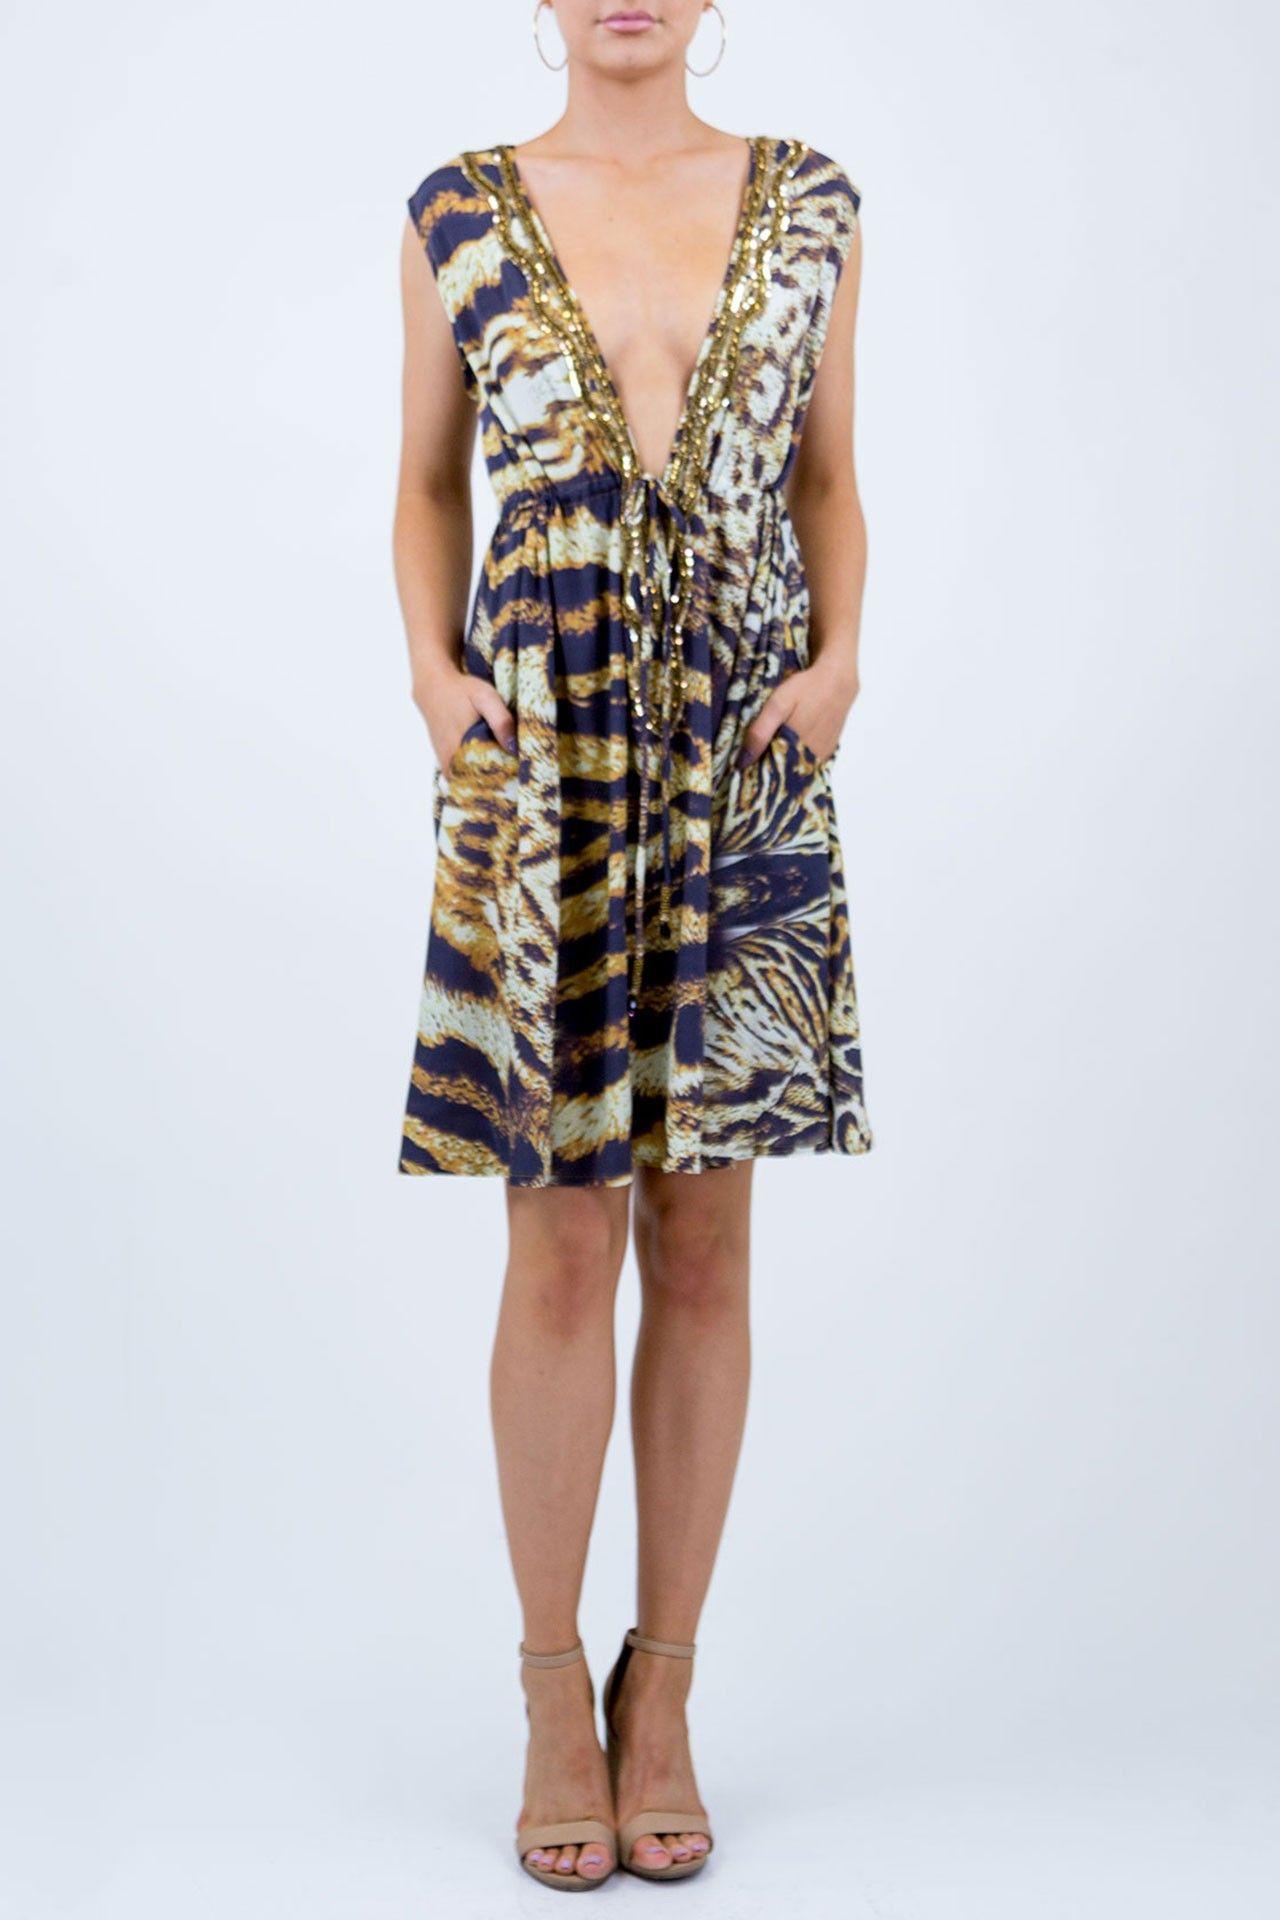 Black Animal Embellished Dress - Designer Women s Clothing - Shahida Parides 6d9426df1b